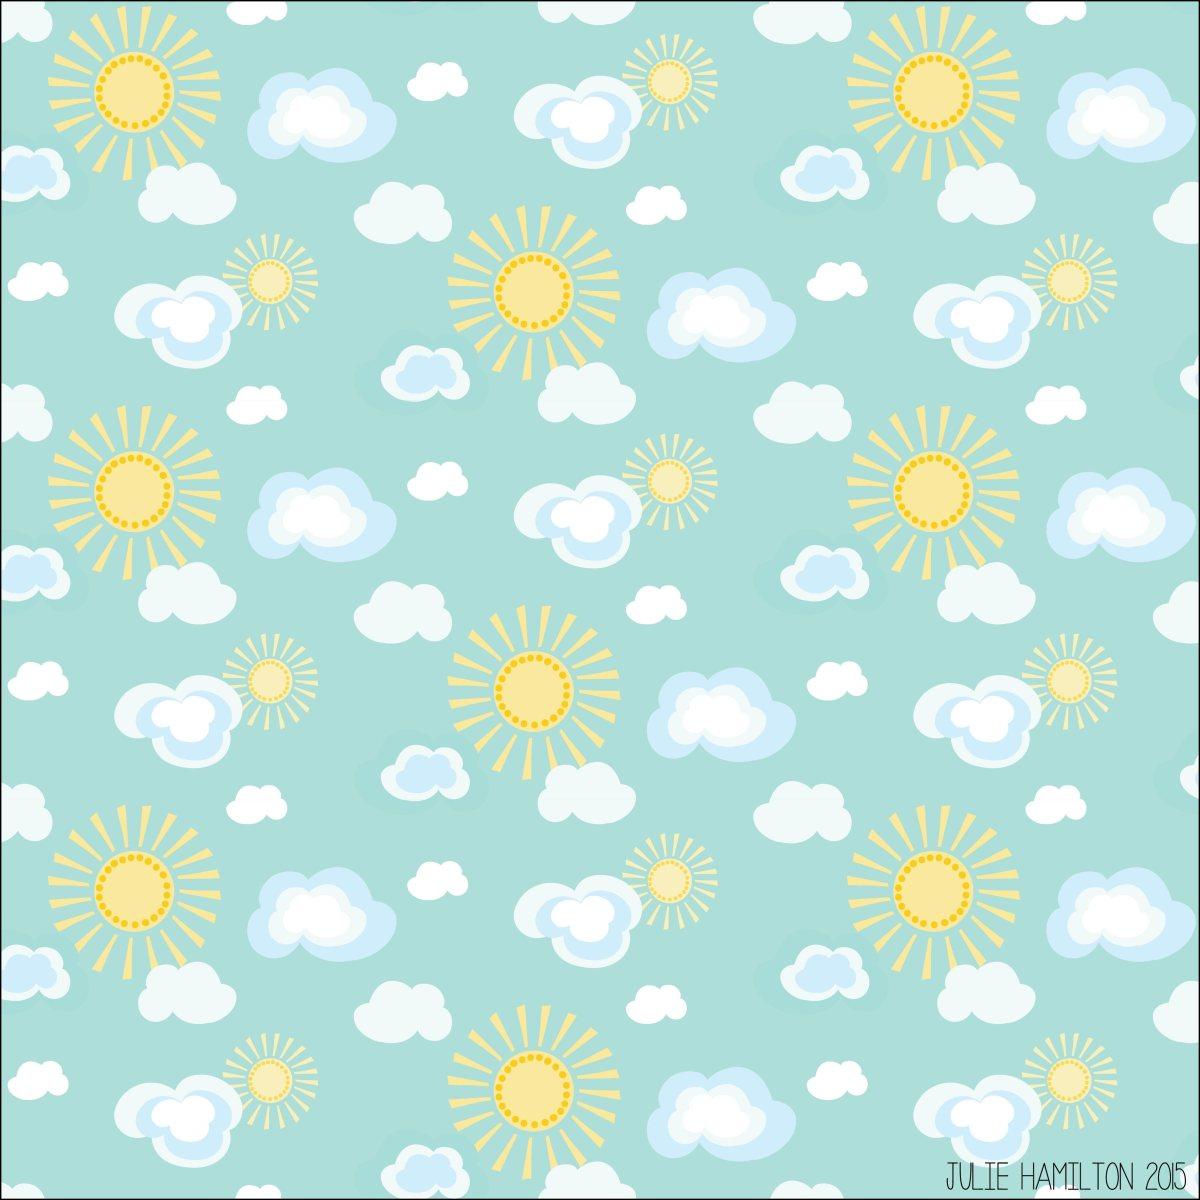 Sun and Clouds - Julie Hamilton Creative {artistically afflicted blog}